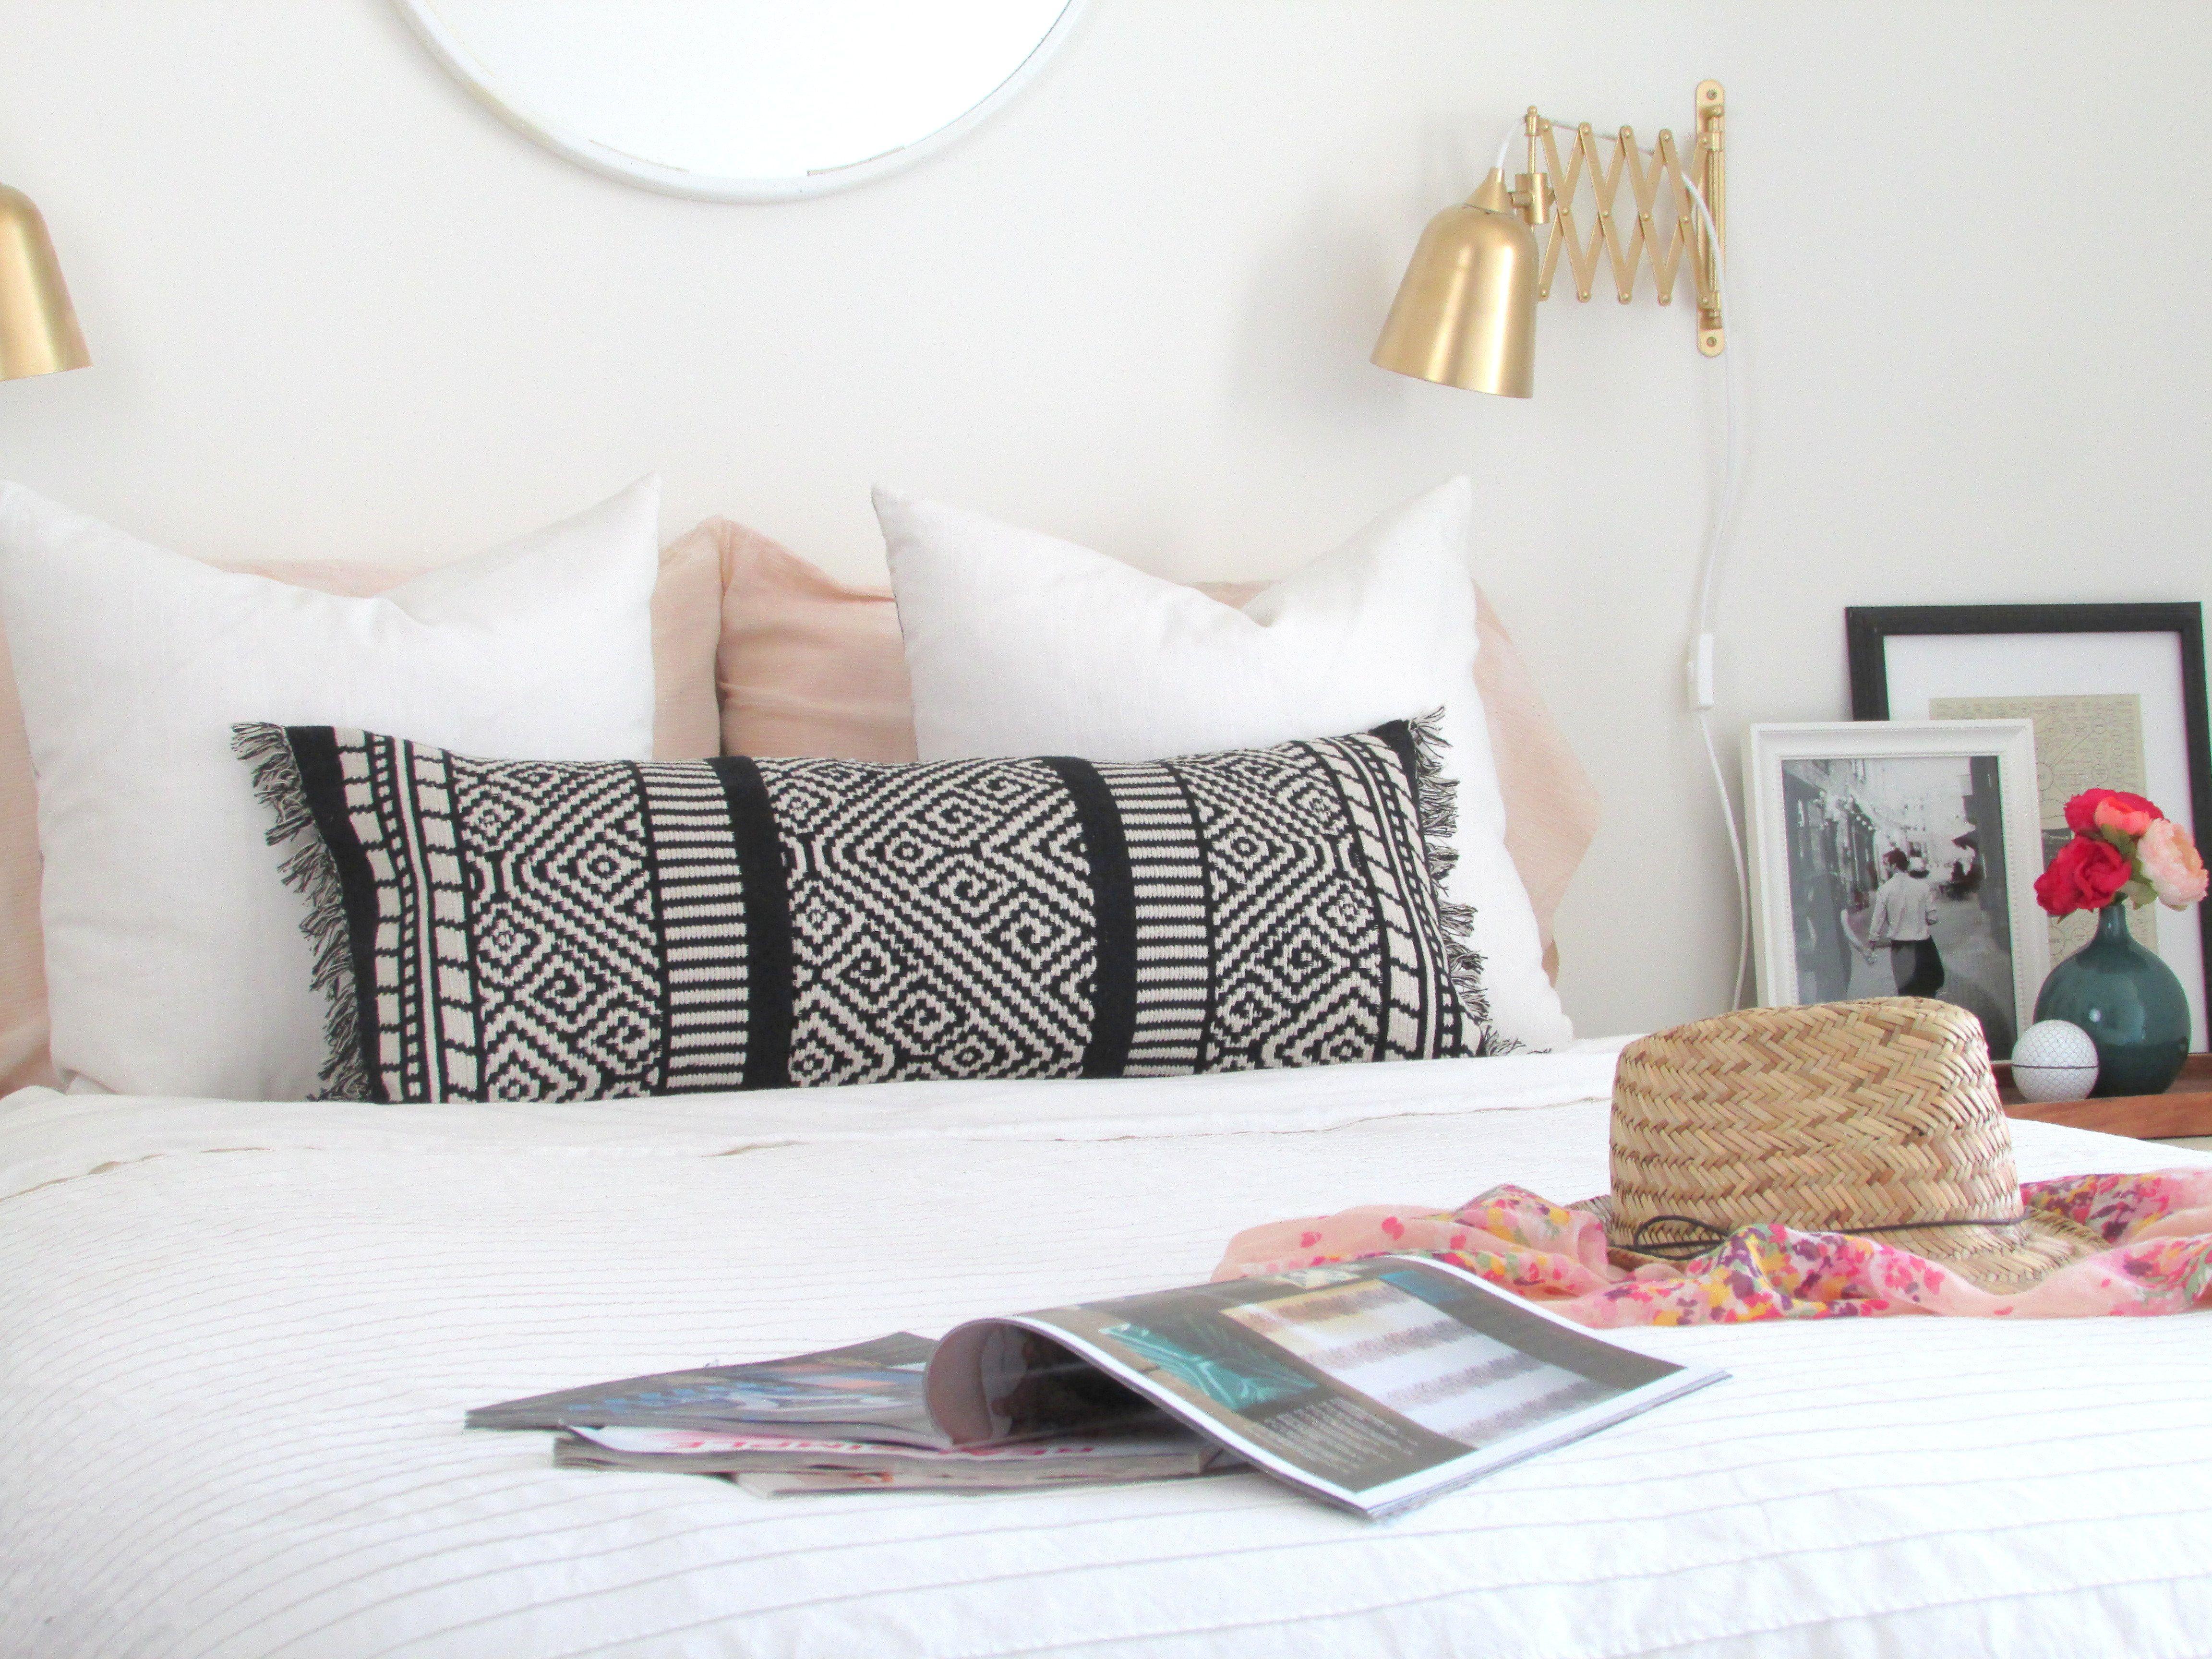 Make a boho lumbar pillow from a table runner boho pillows and craft